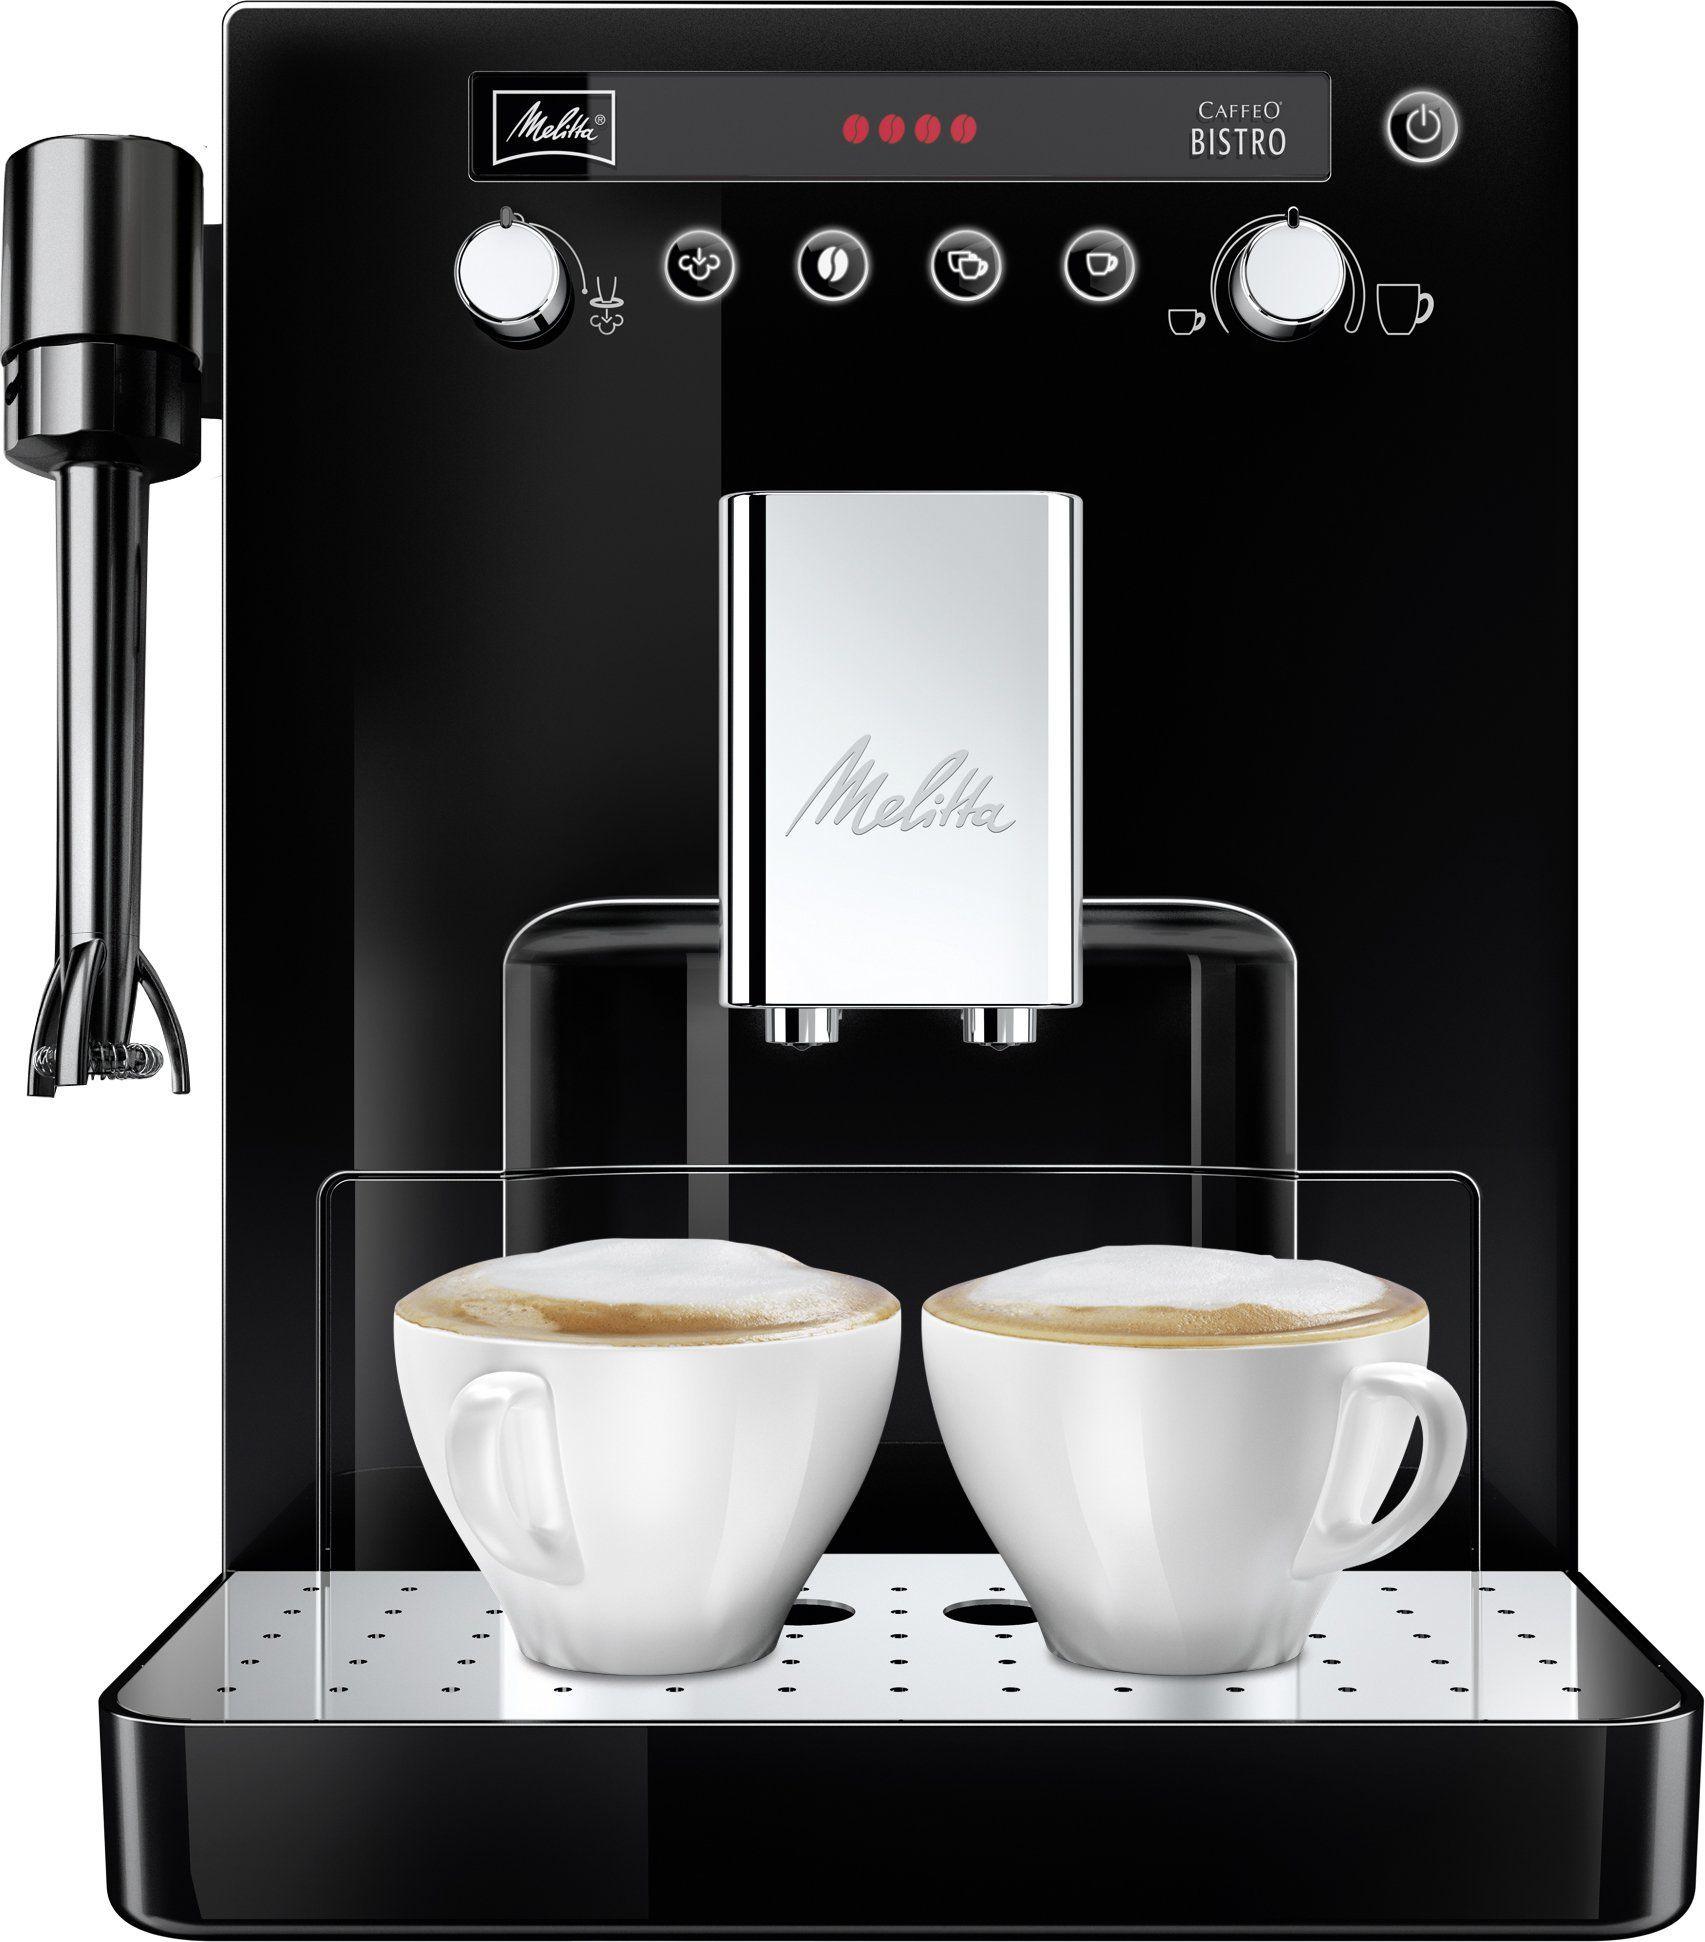 Melitta MEL661382 Coffee Machine Coffee maker reviews